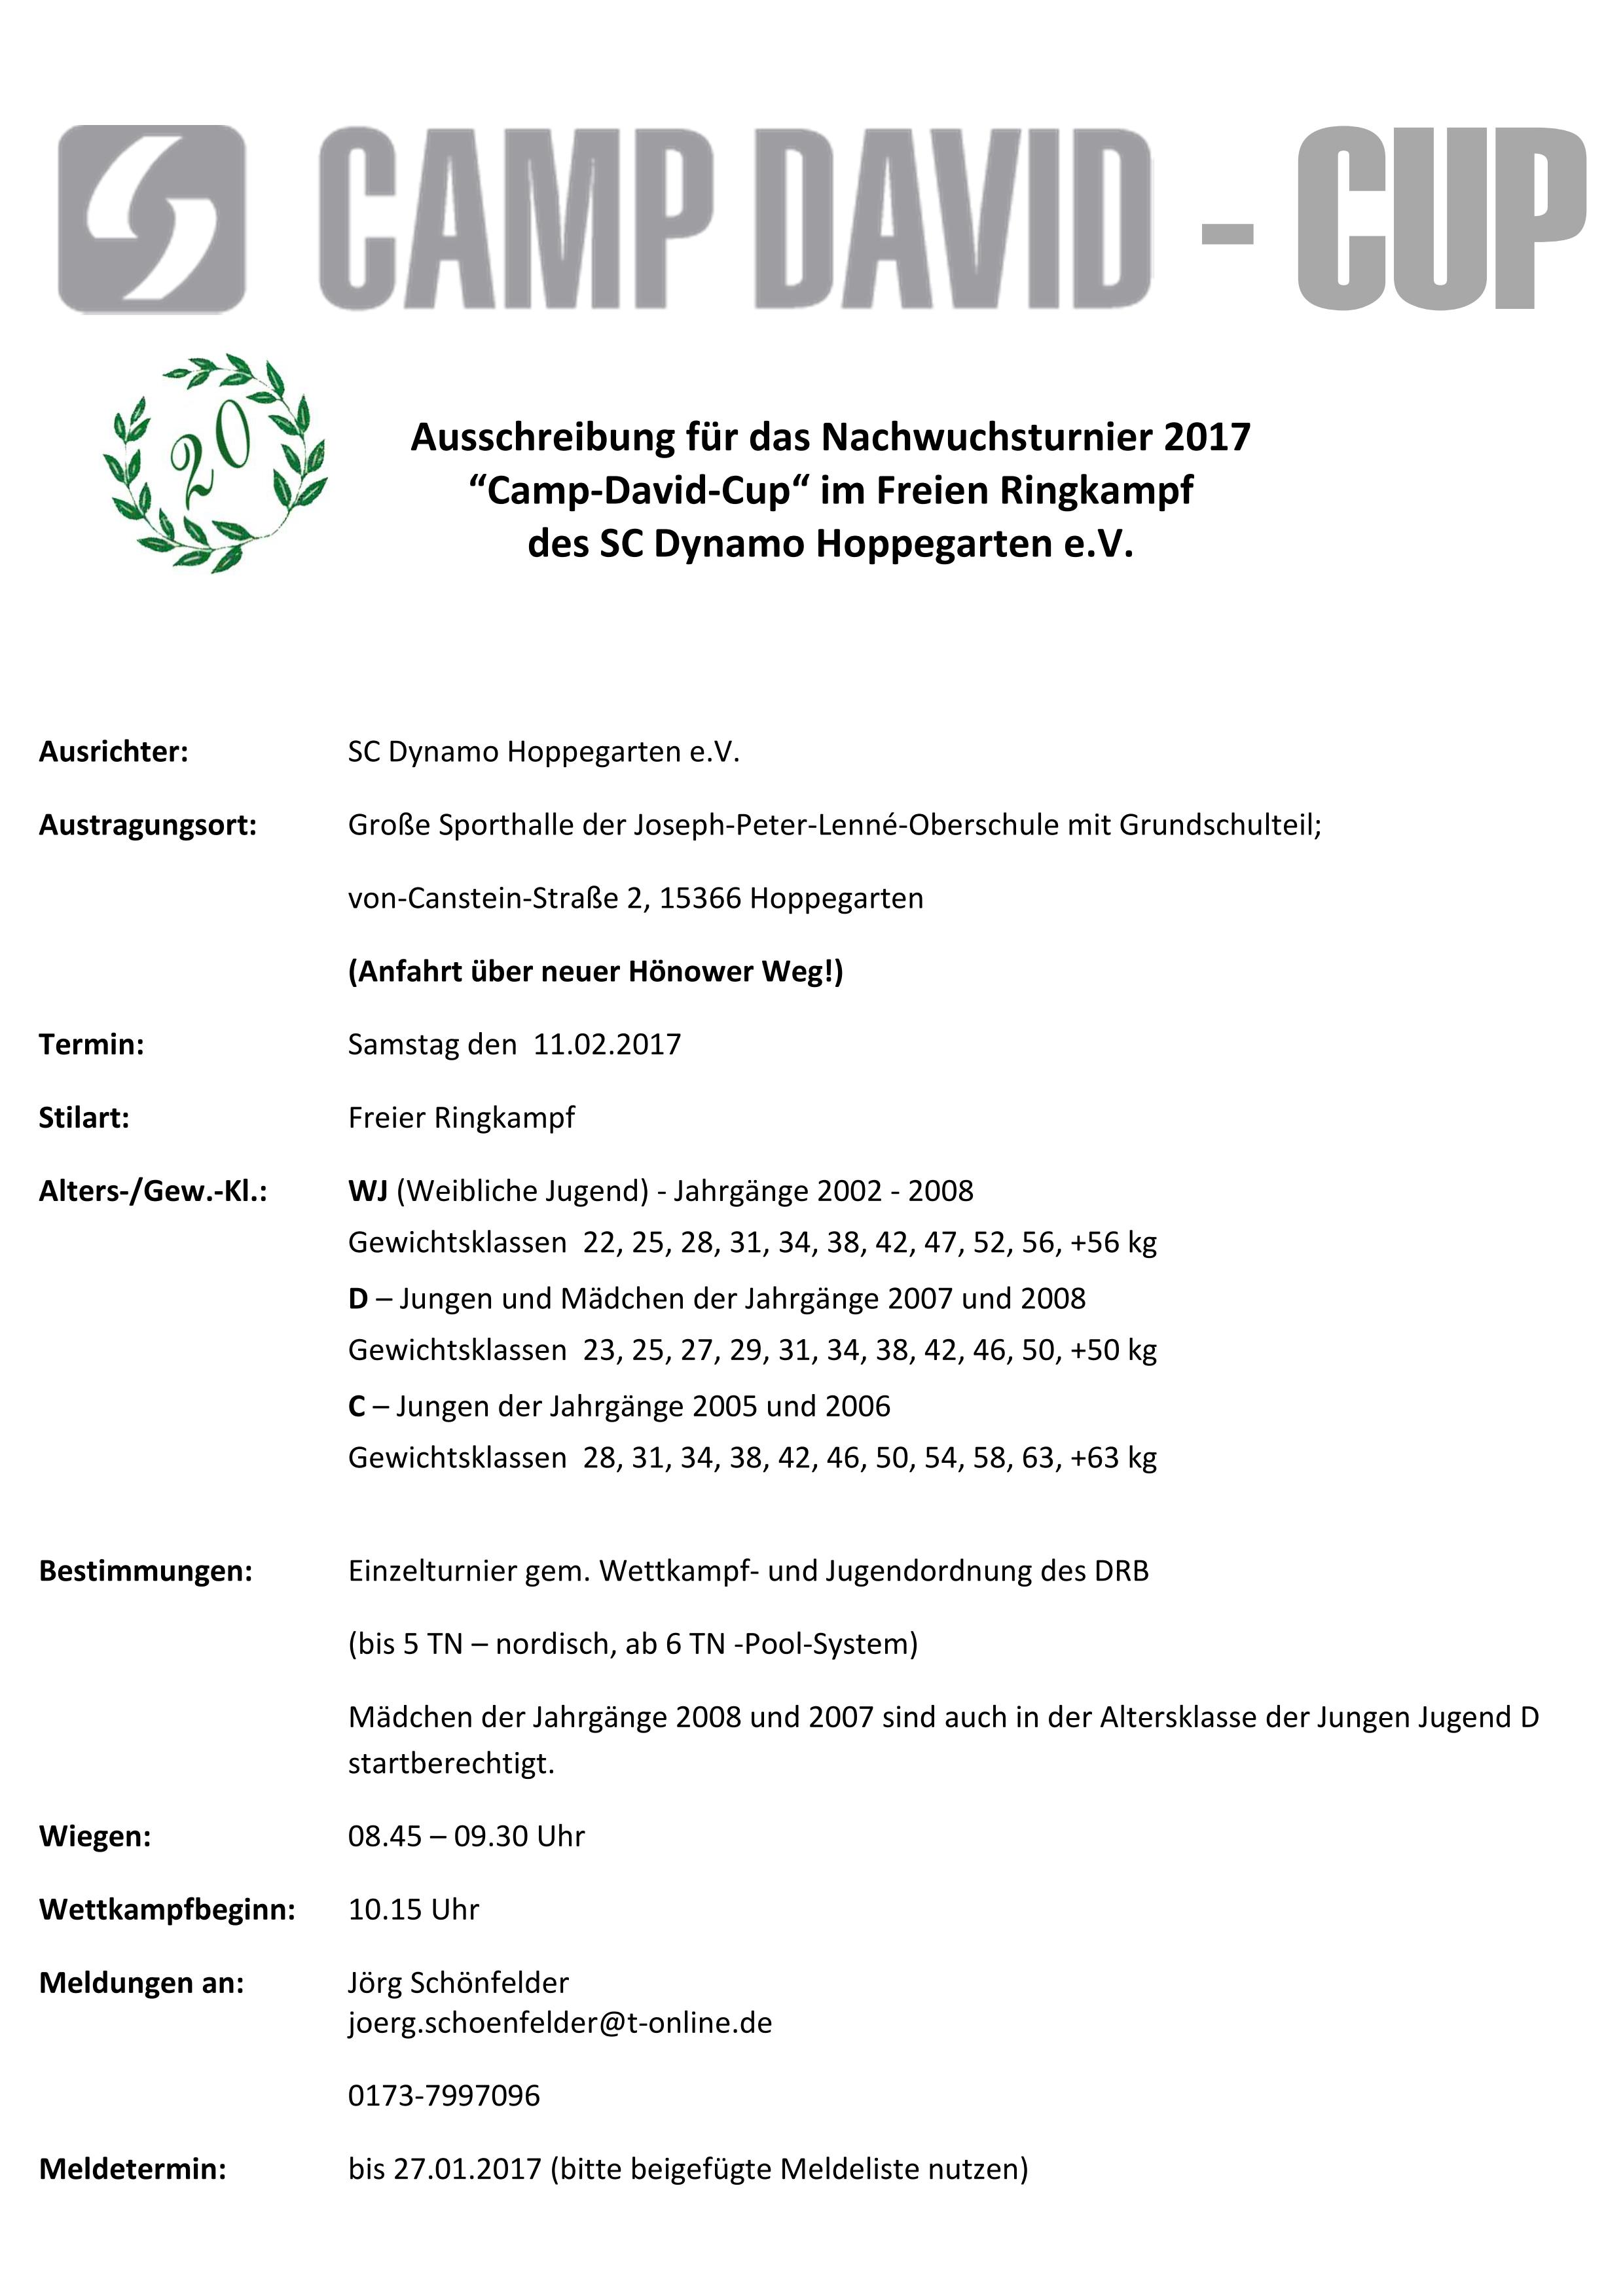 Camp David Cup Weibl. Jugend & C/D-Jugend 2017